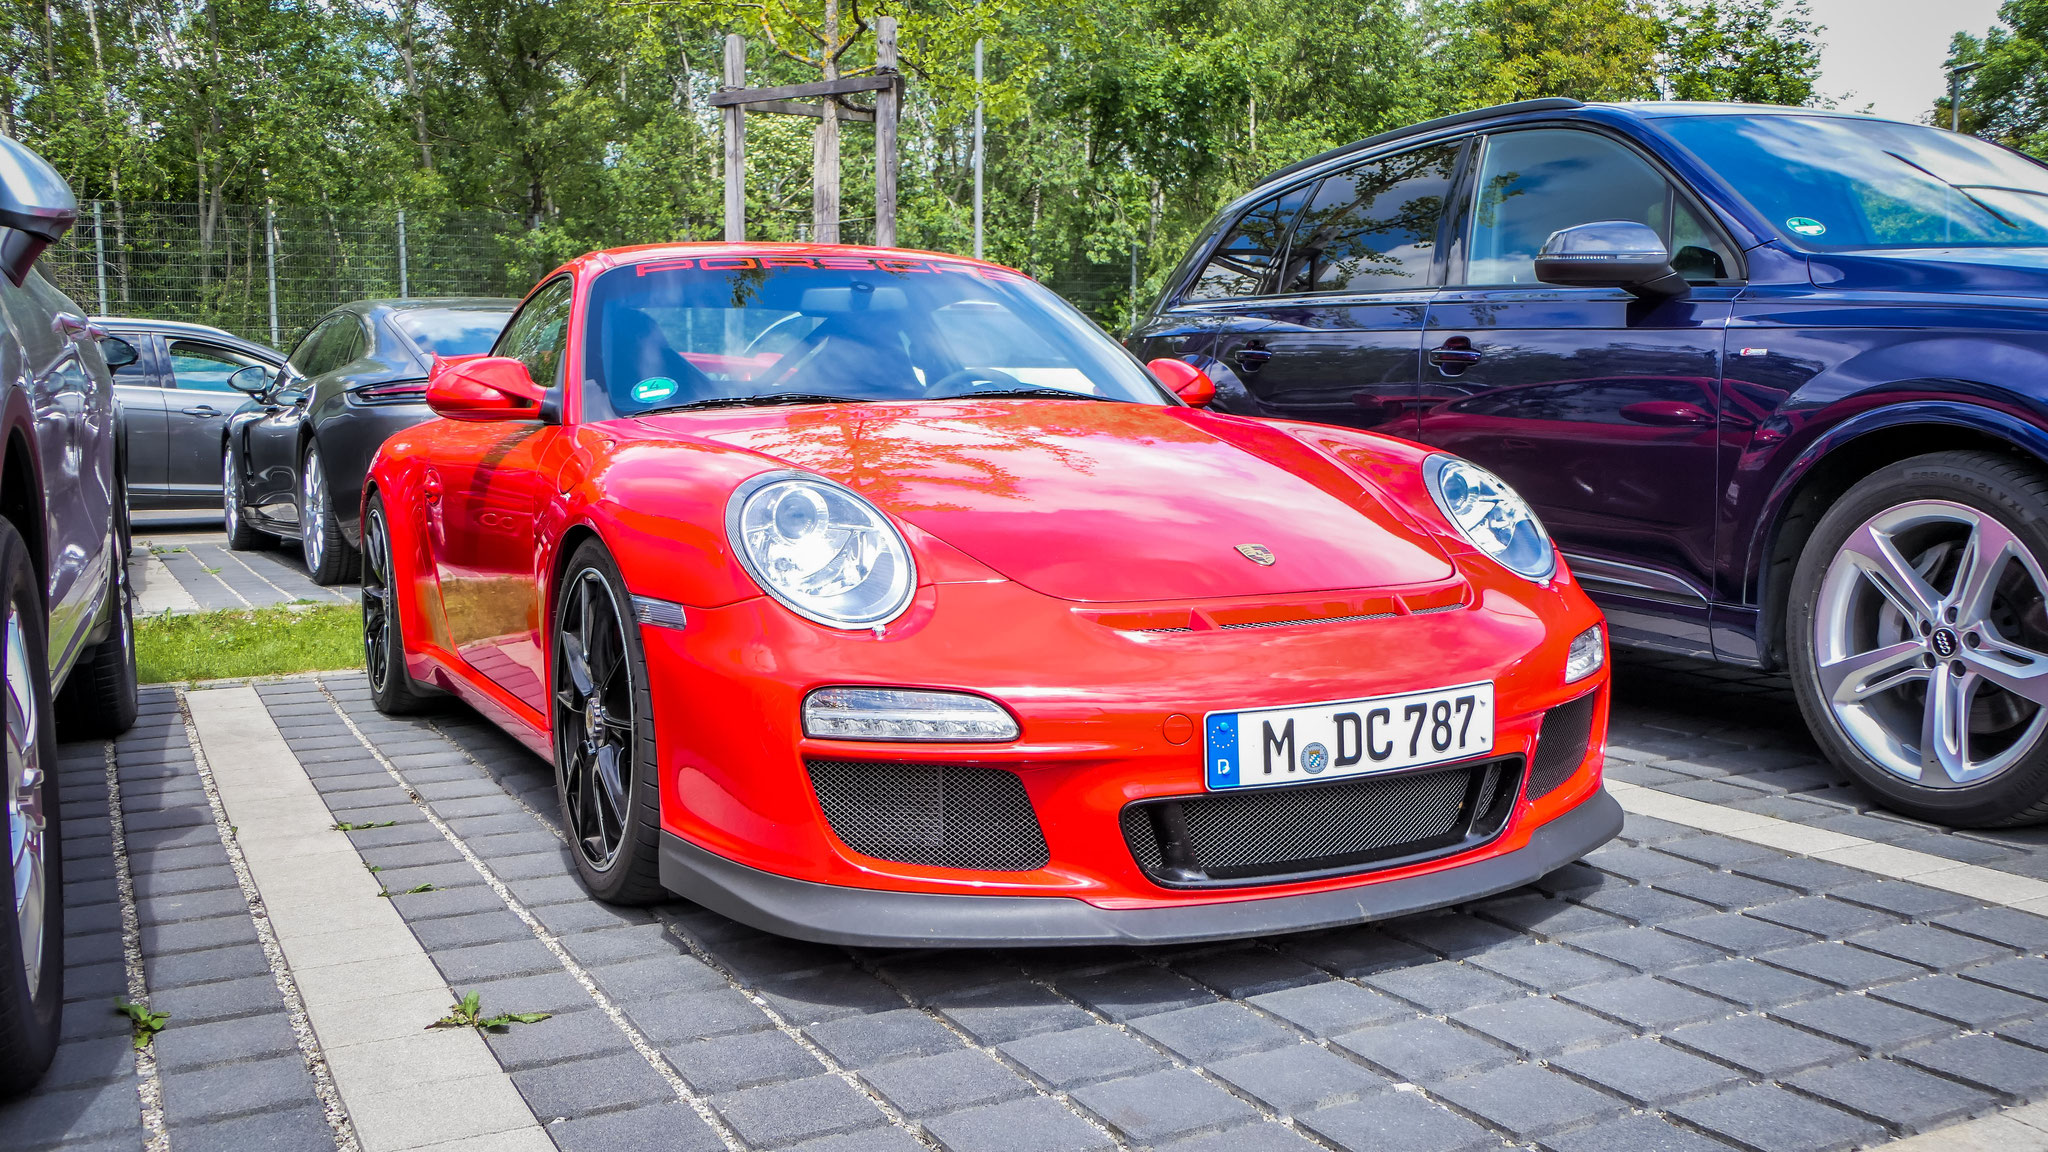 Porsche GT3 997 - M-DC-787